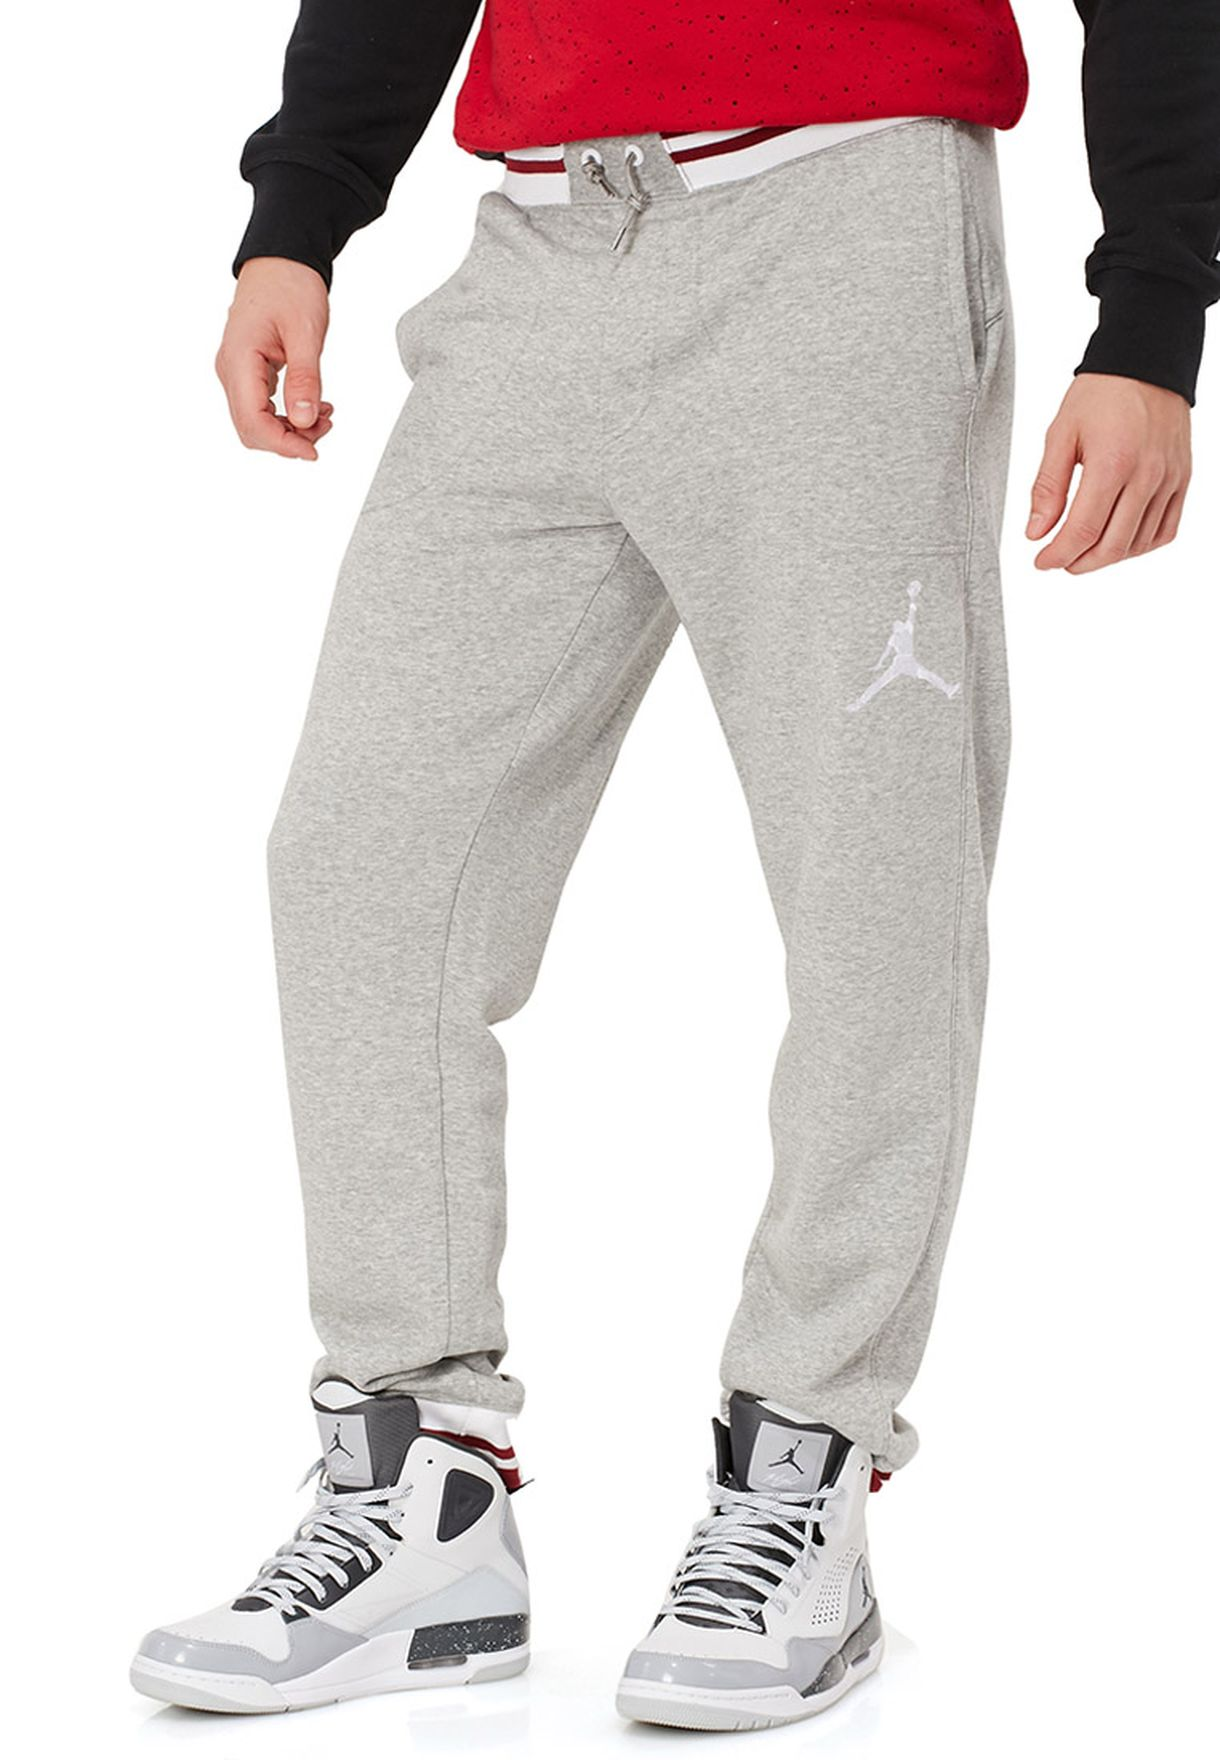 a4caee76abd74e Shop Nike grey Jordan Varsity Sweatpants for Men in Bahrain ...